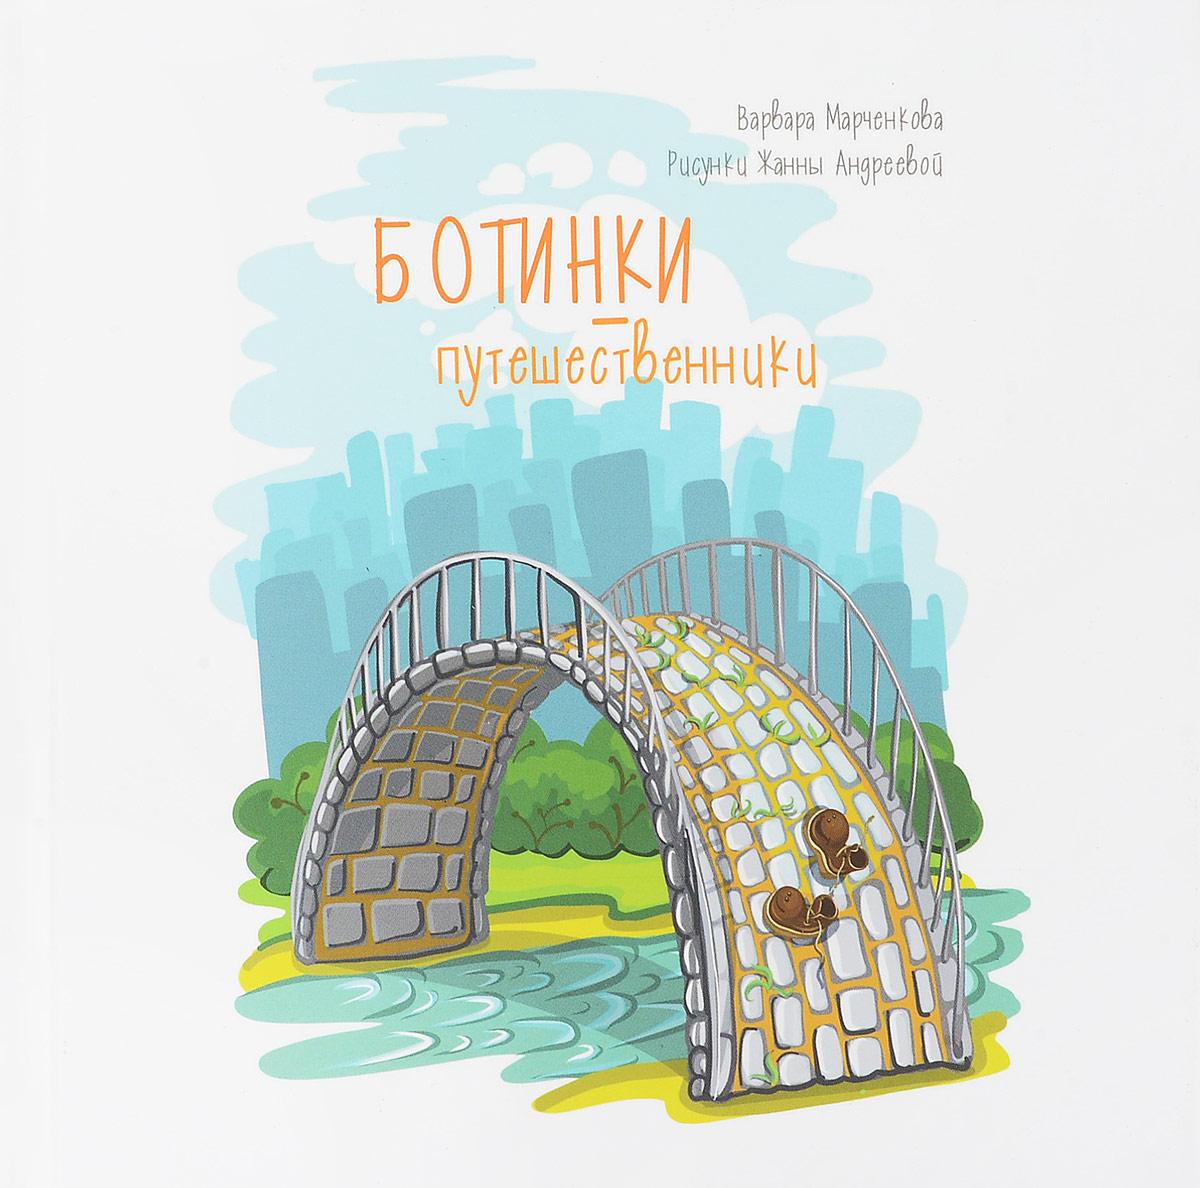 Варвара Марченкова Ботинки-путешественники марченкова в о ботинки путешественники